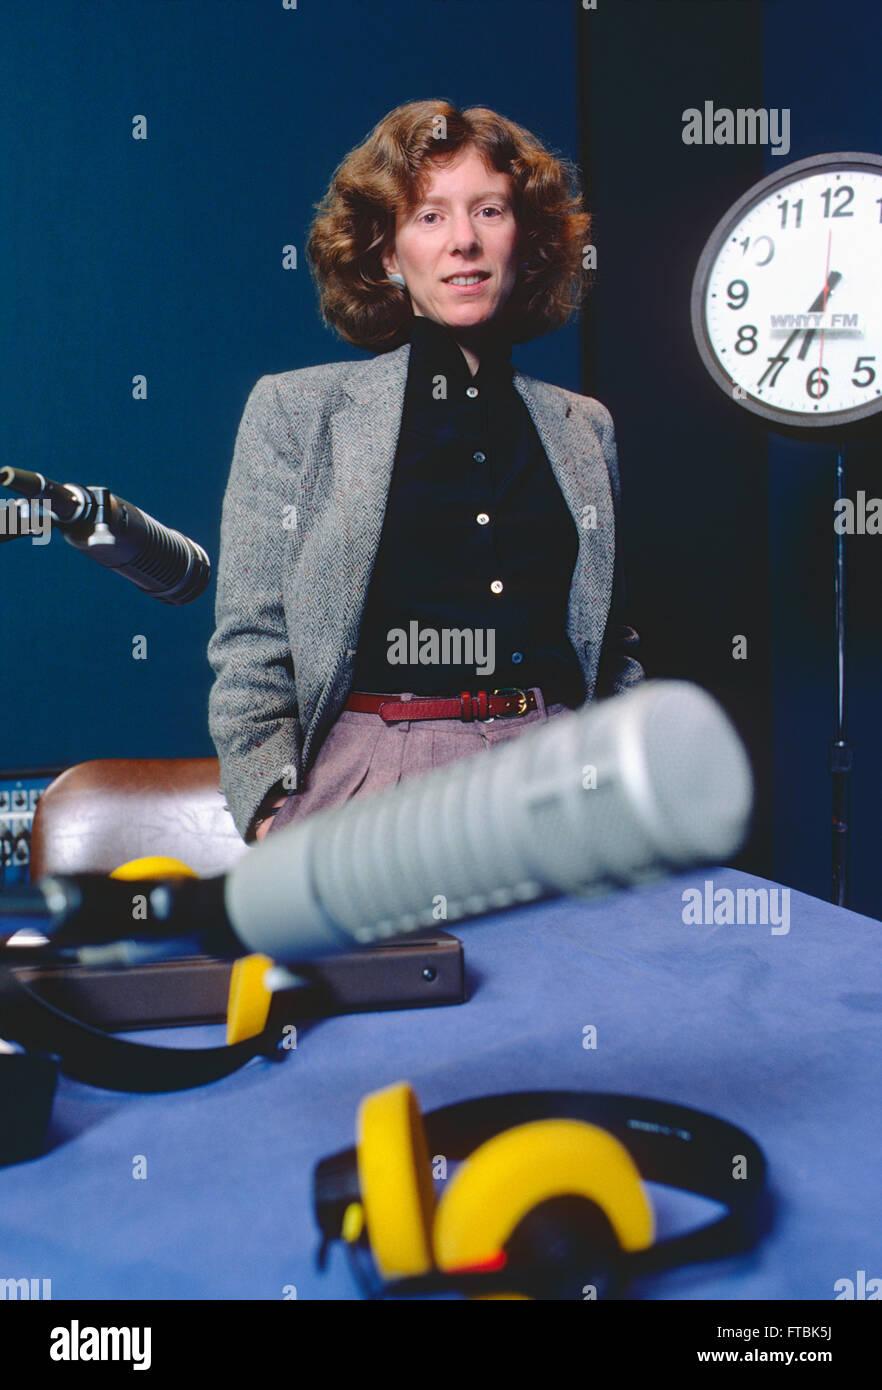 Portrait of Terry Gross, host of National Public Radio's 'Fresh Air'; WHYY FM studio; Philadelphia; - Stock Image